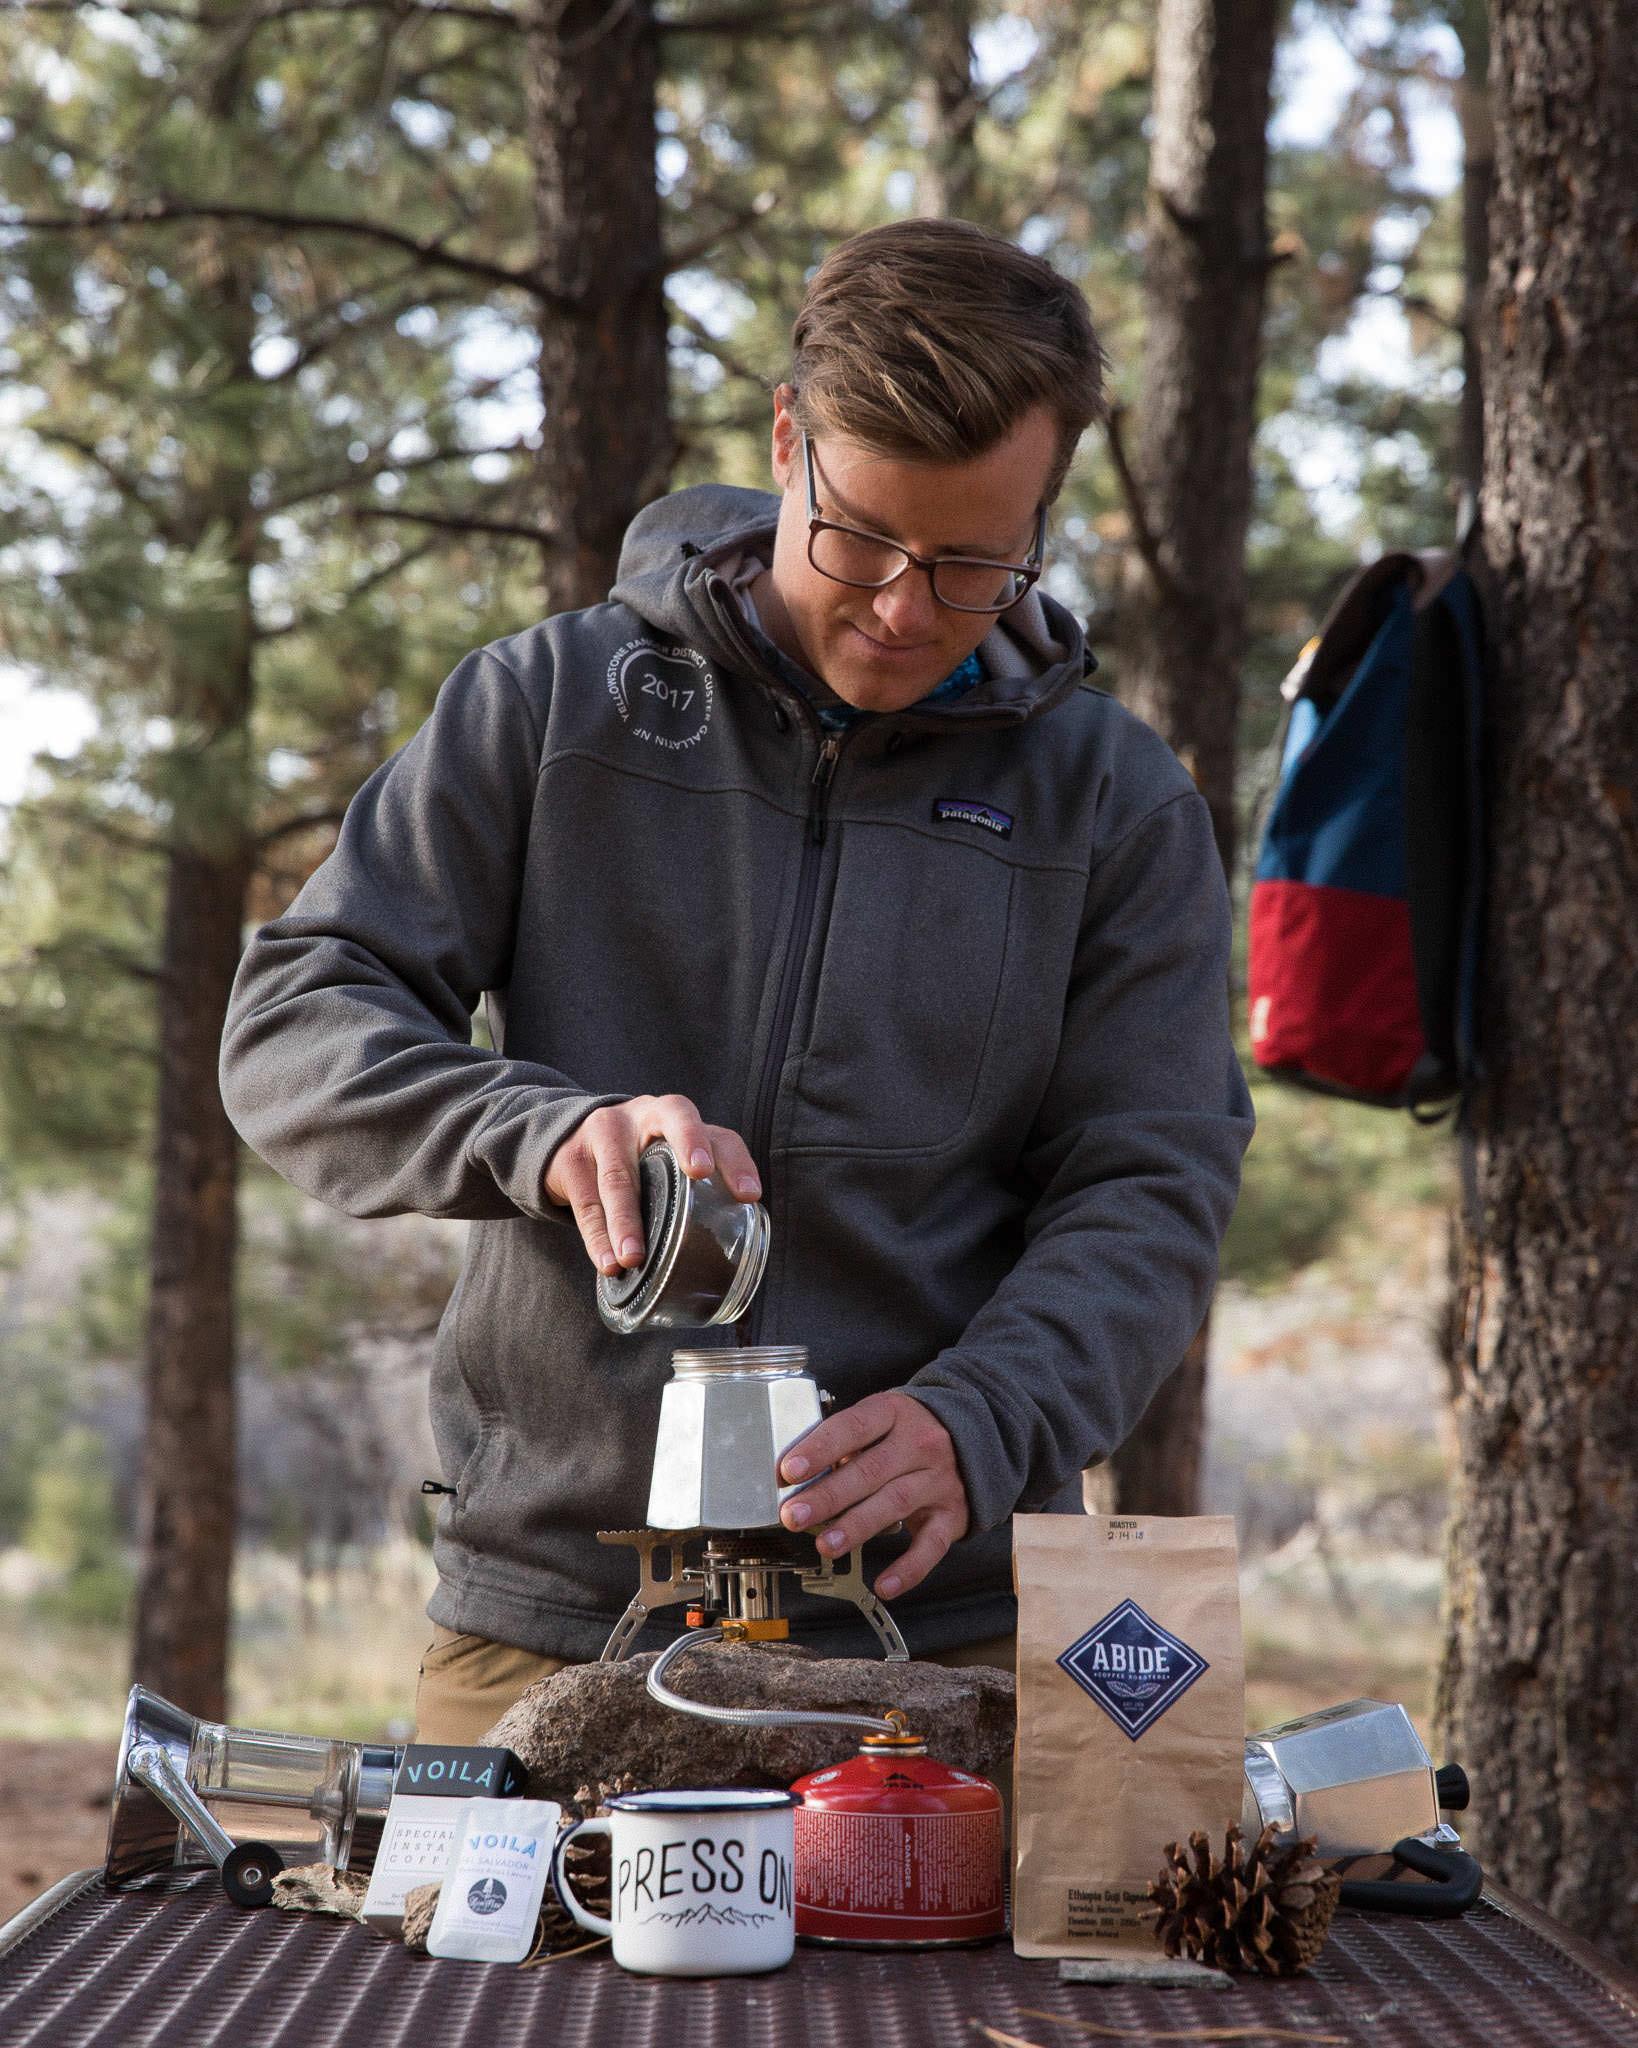 Add finely ground coffee to moka pot filter basket